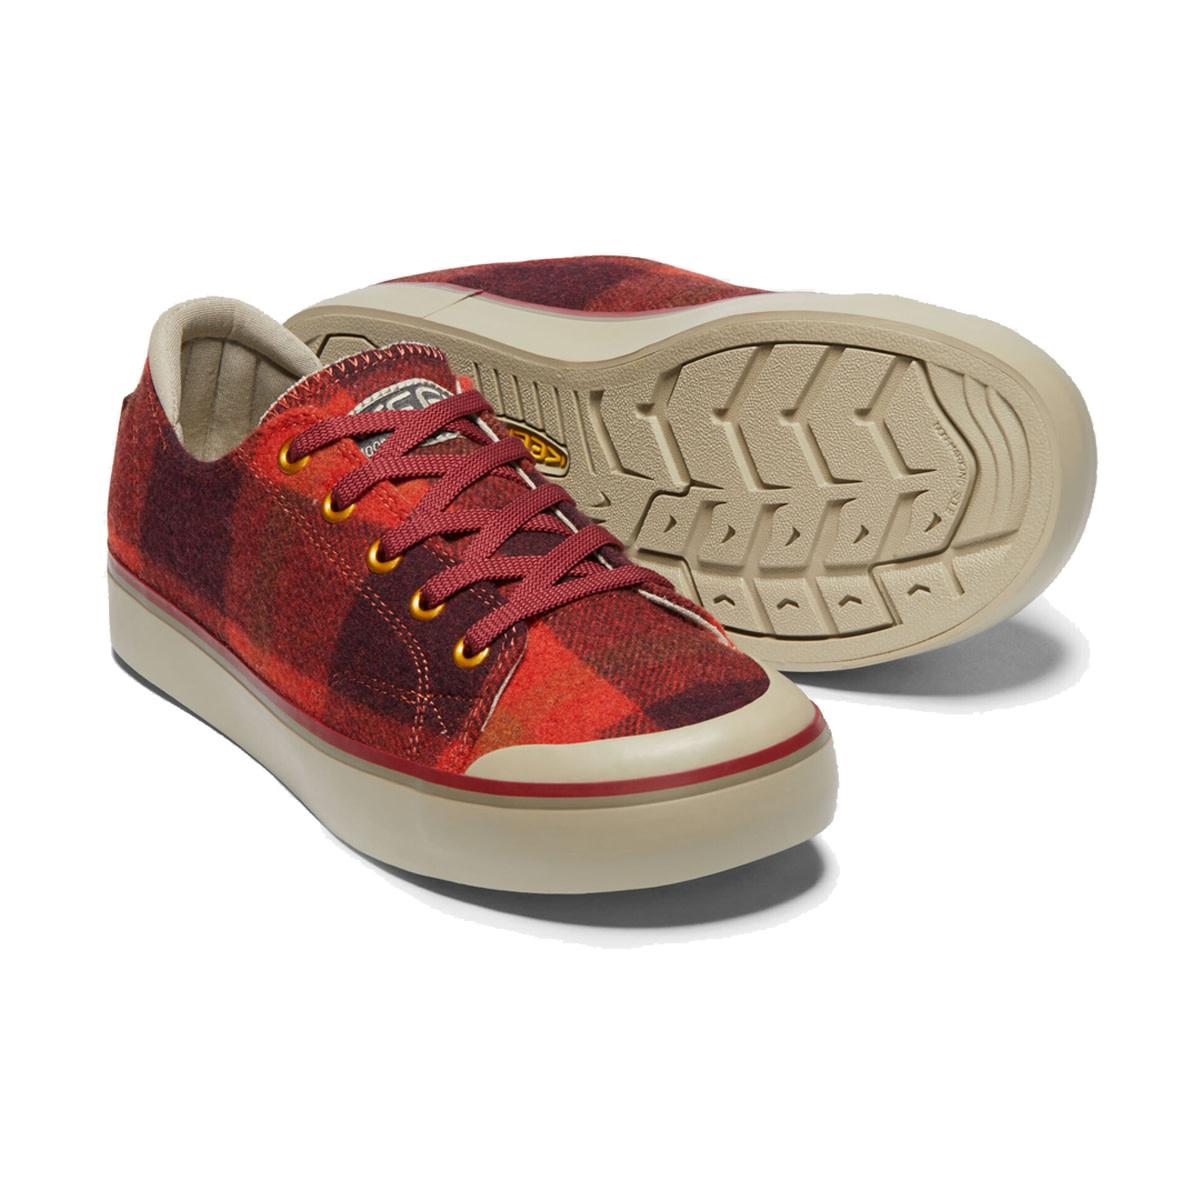 Keen Keen Elsa III Sneaker Red Plaid